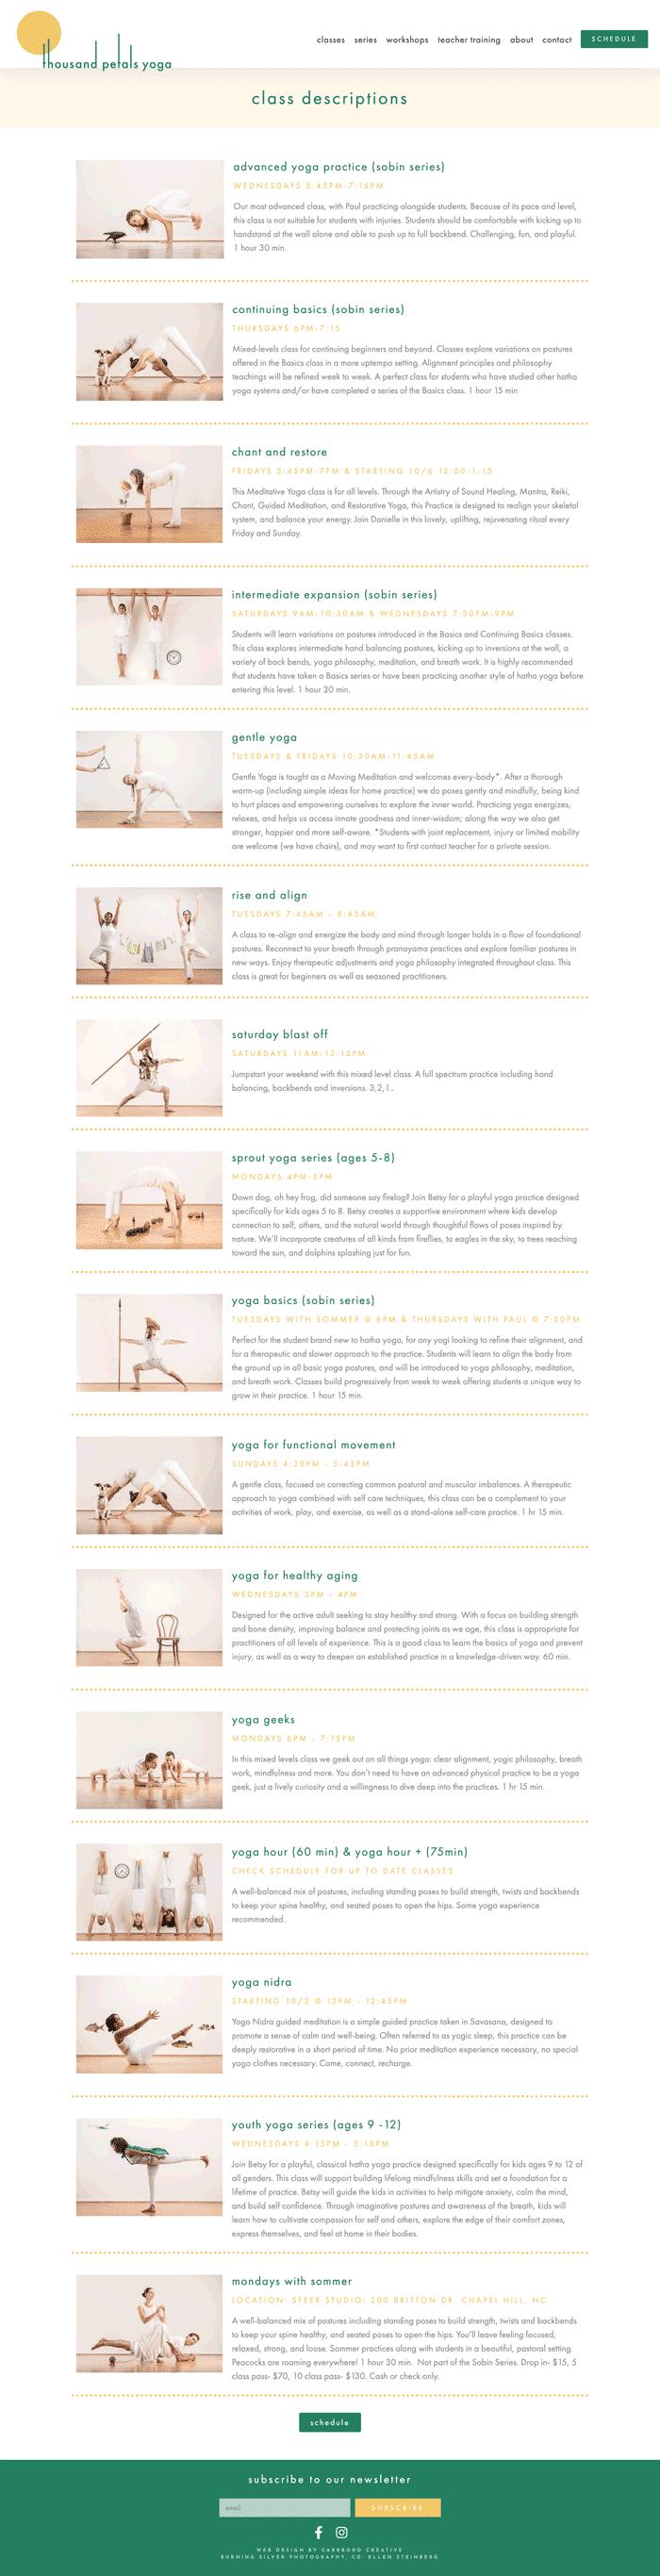 Web Design Mockup of Yoga Teacher Training Page